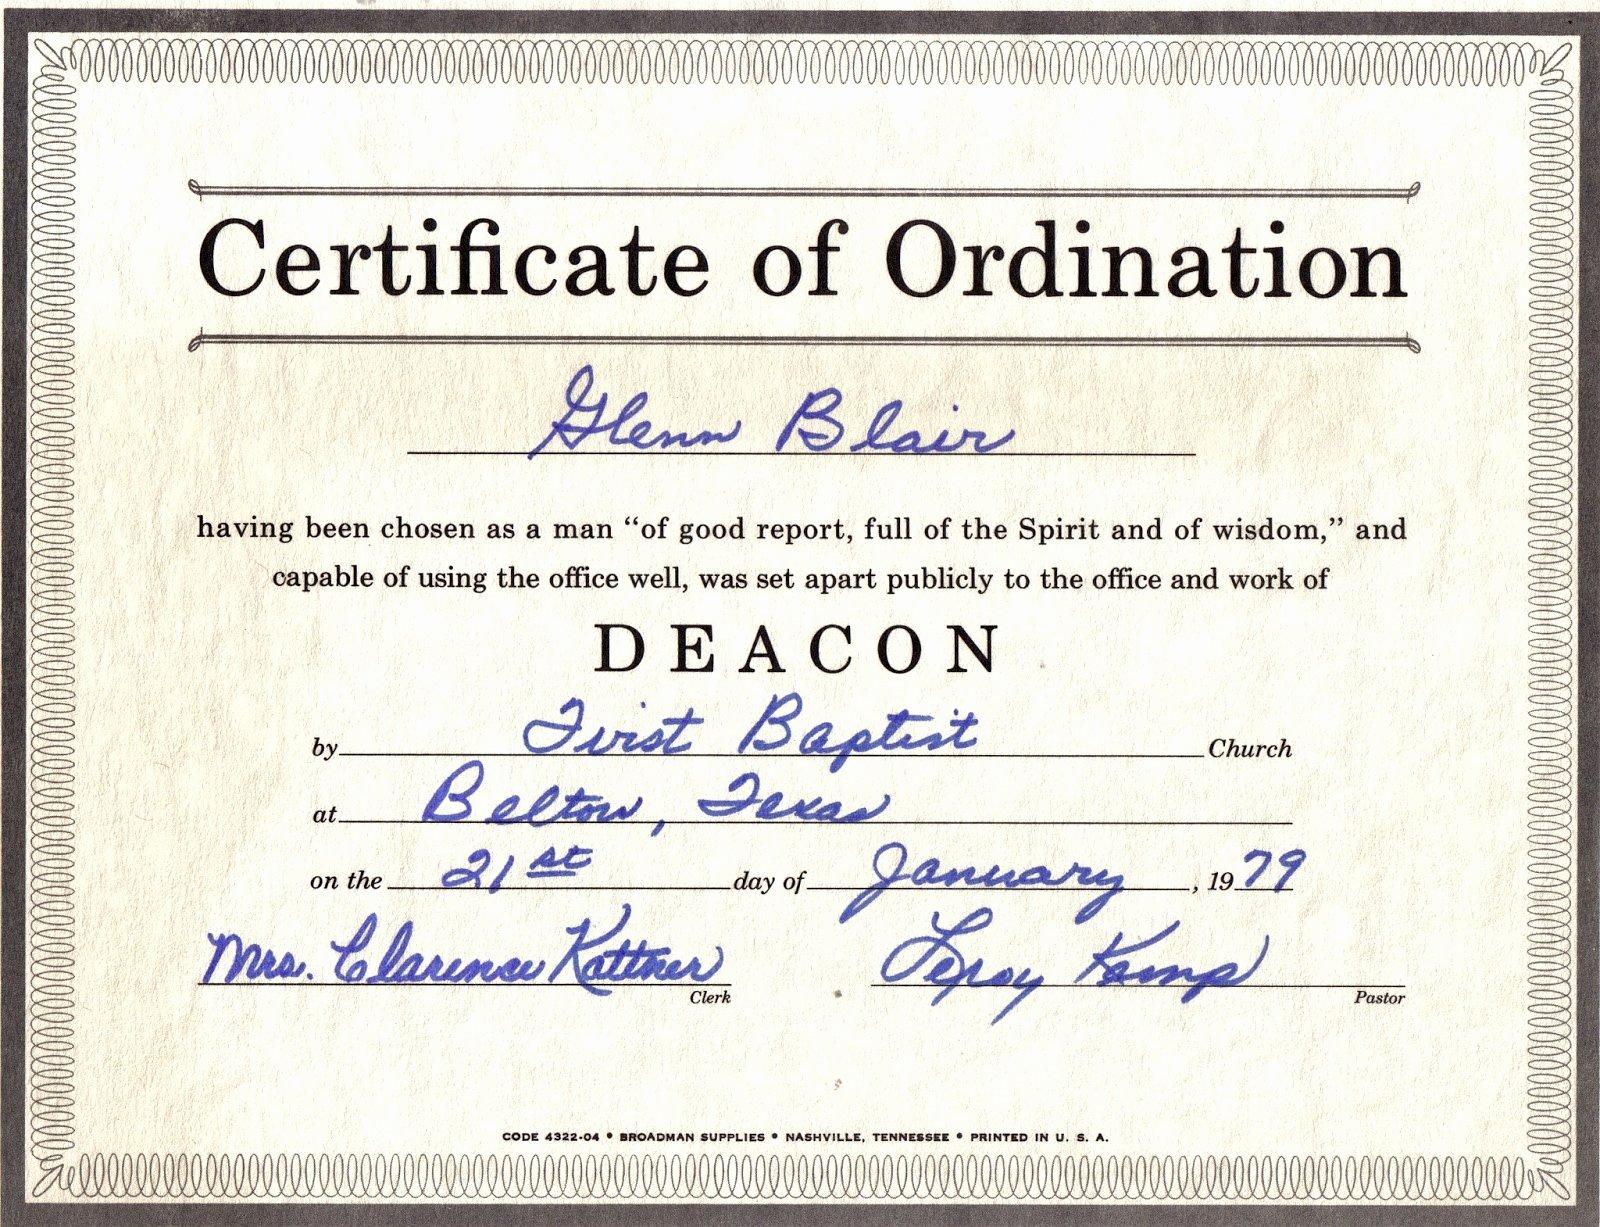 Certificate Of ordination Template Lovely the Family History Of Billy Blair Robert Glenn & Wanda